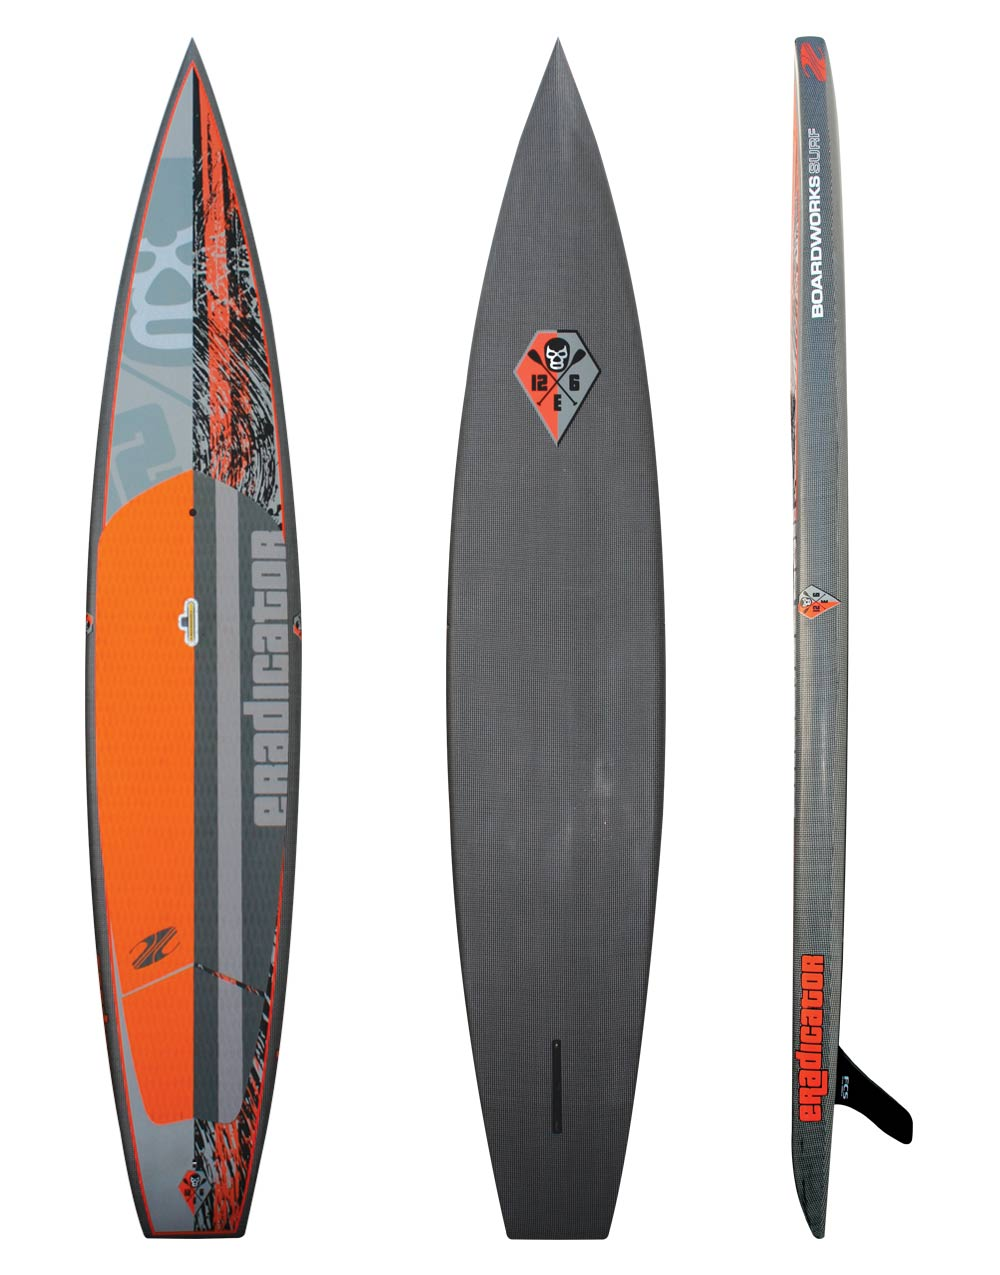 Eradicator 14' Carbon/innegra race board $2600 Sale $1900